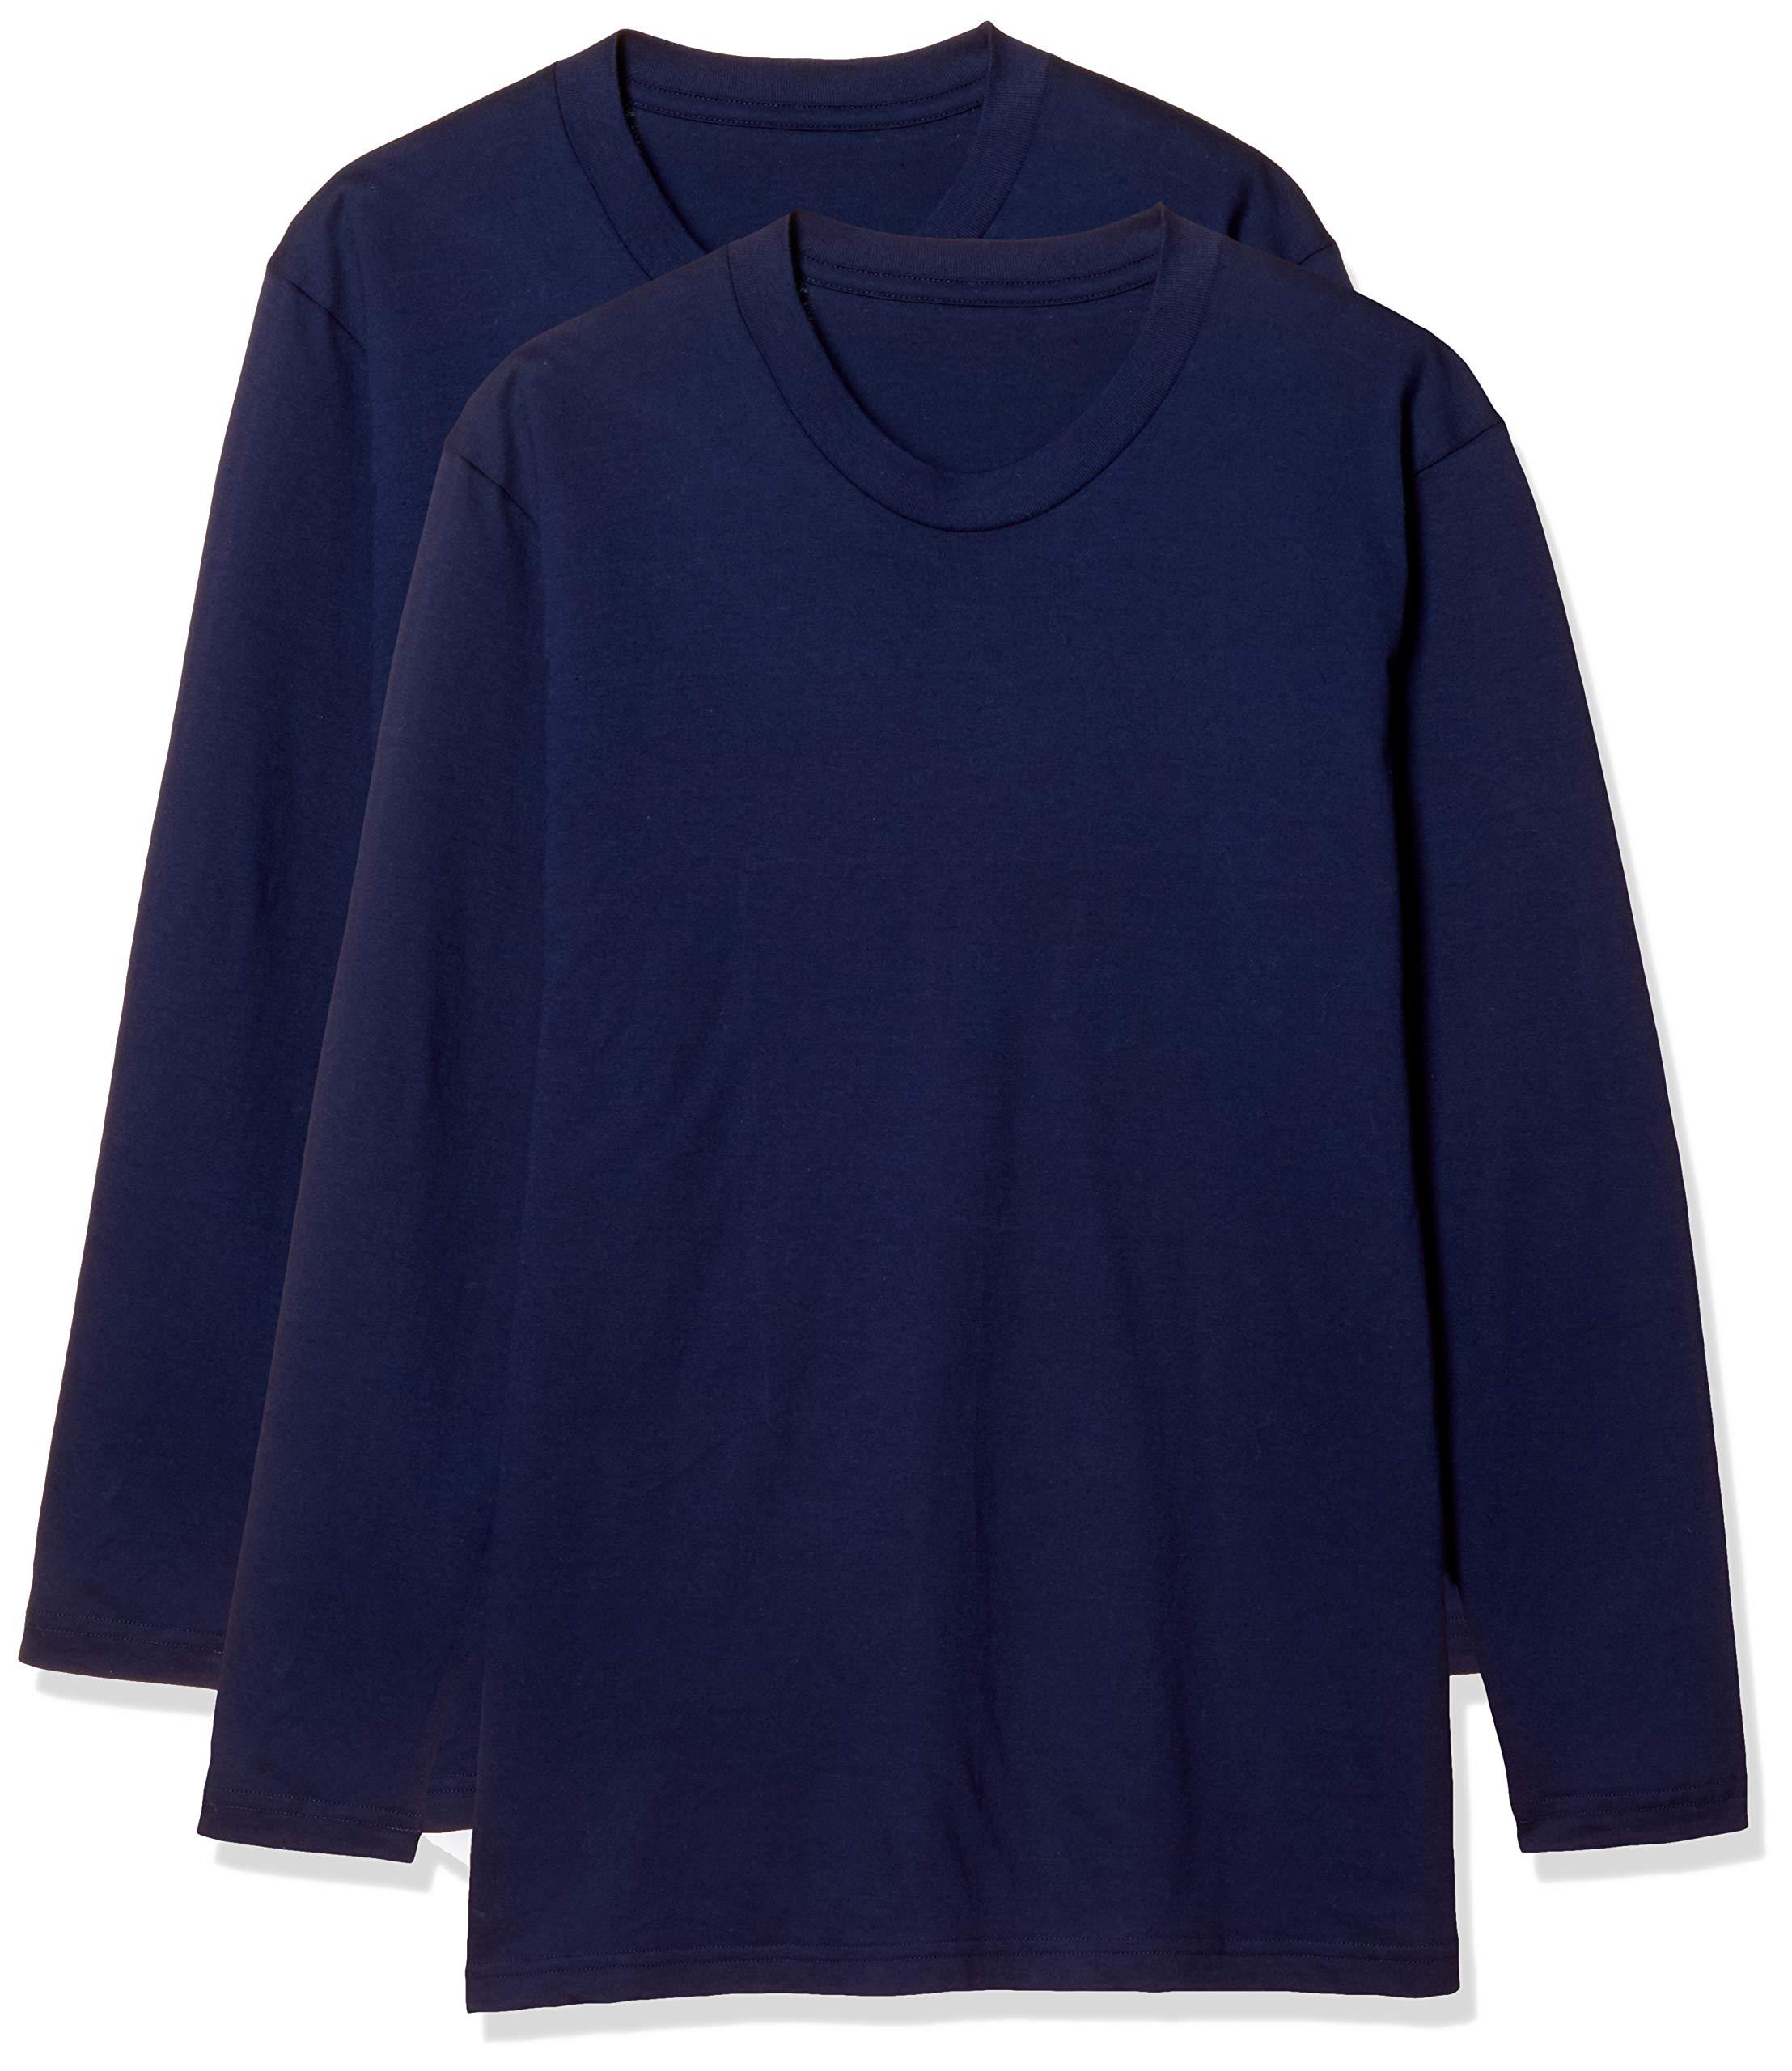 [Seshiel(グンゼ)GUNZE長ズボン柔らかい綿の下着は、*** ***フロントホックは、消臭プロセス2を意味し、 ]男性の綿の長袖Tシャツ(同じ色の二組)腋窩シンプルなシームレスKP-753